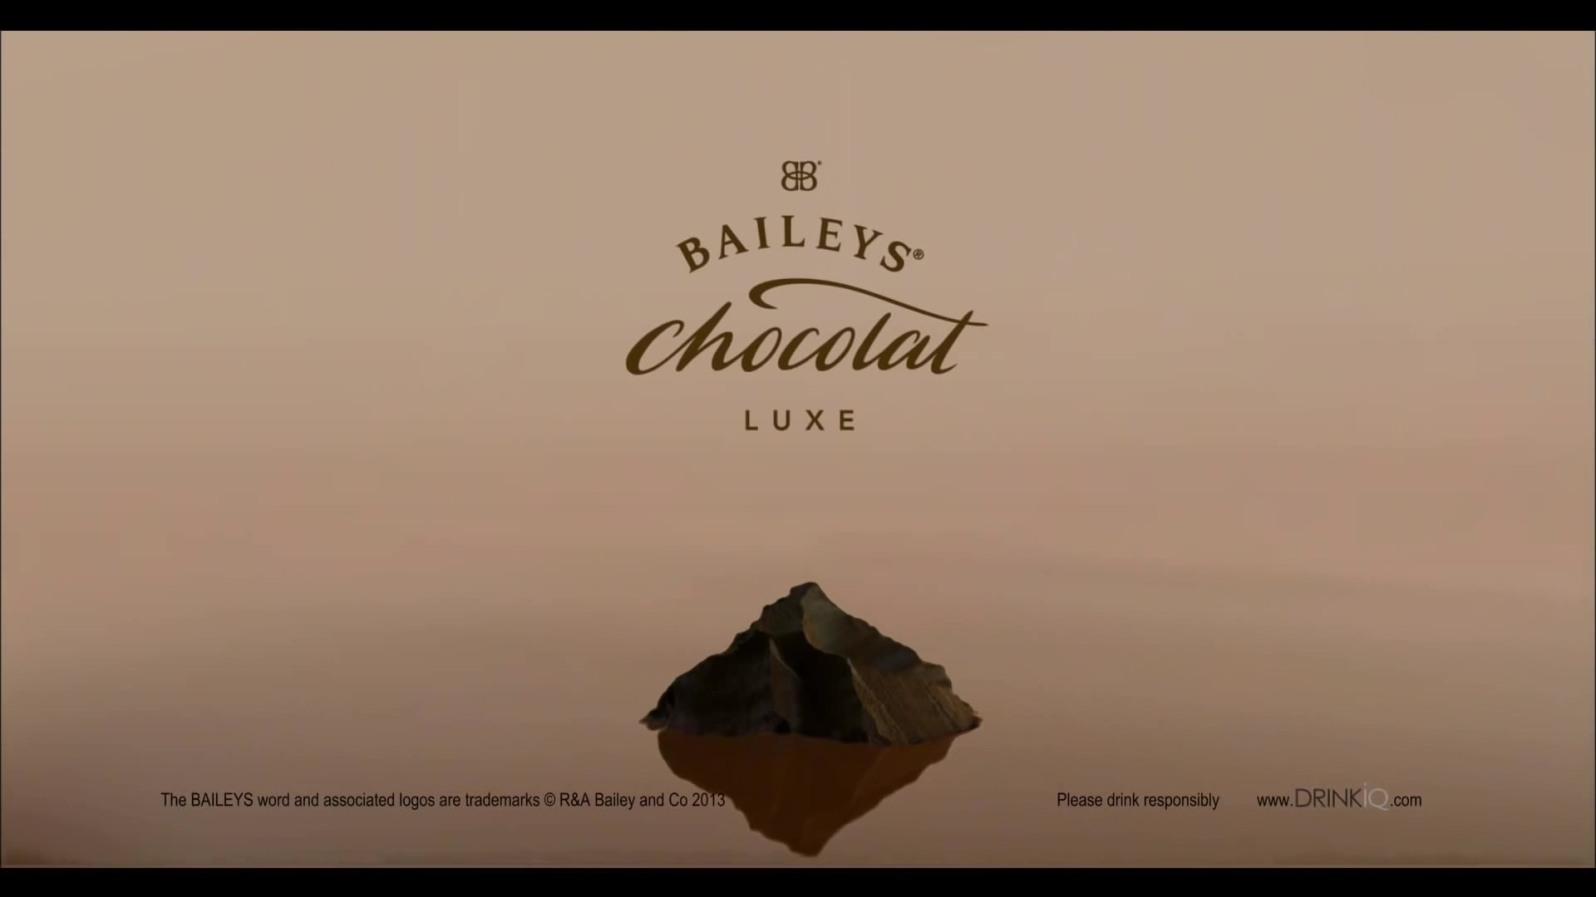 sc-baileys-chocolat-luxe-3